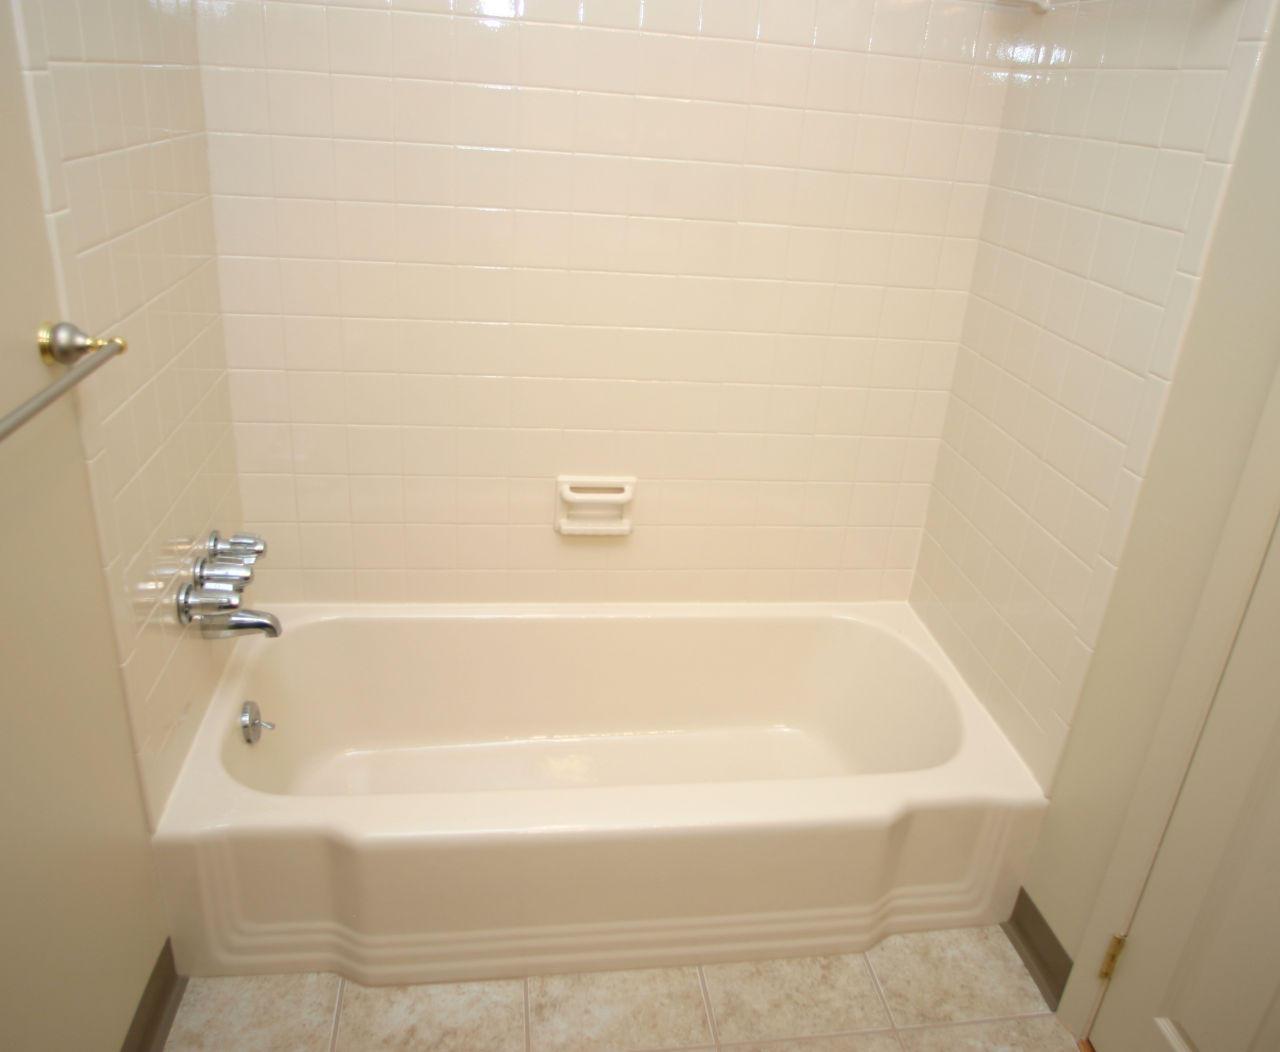 Bathroom Tile Tub & Shower Repairs   Pittsburgh & East Ohio low as $250